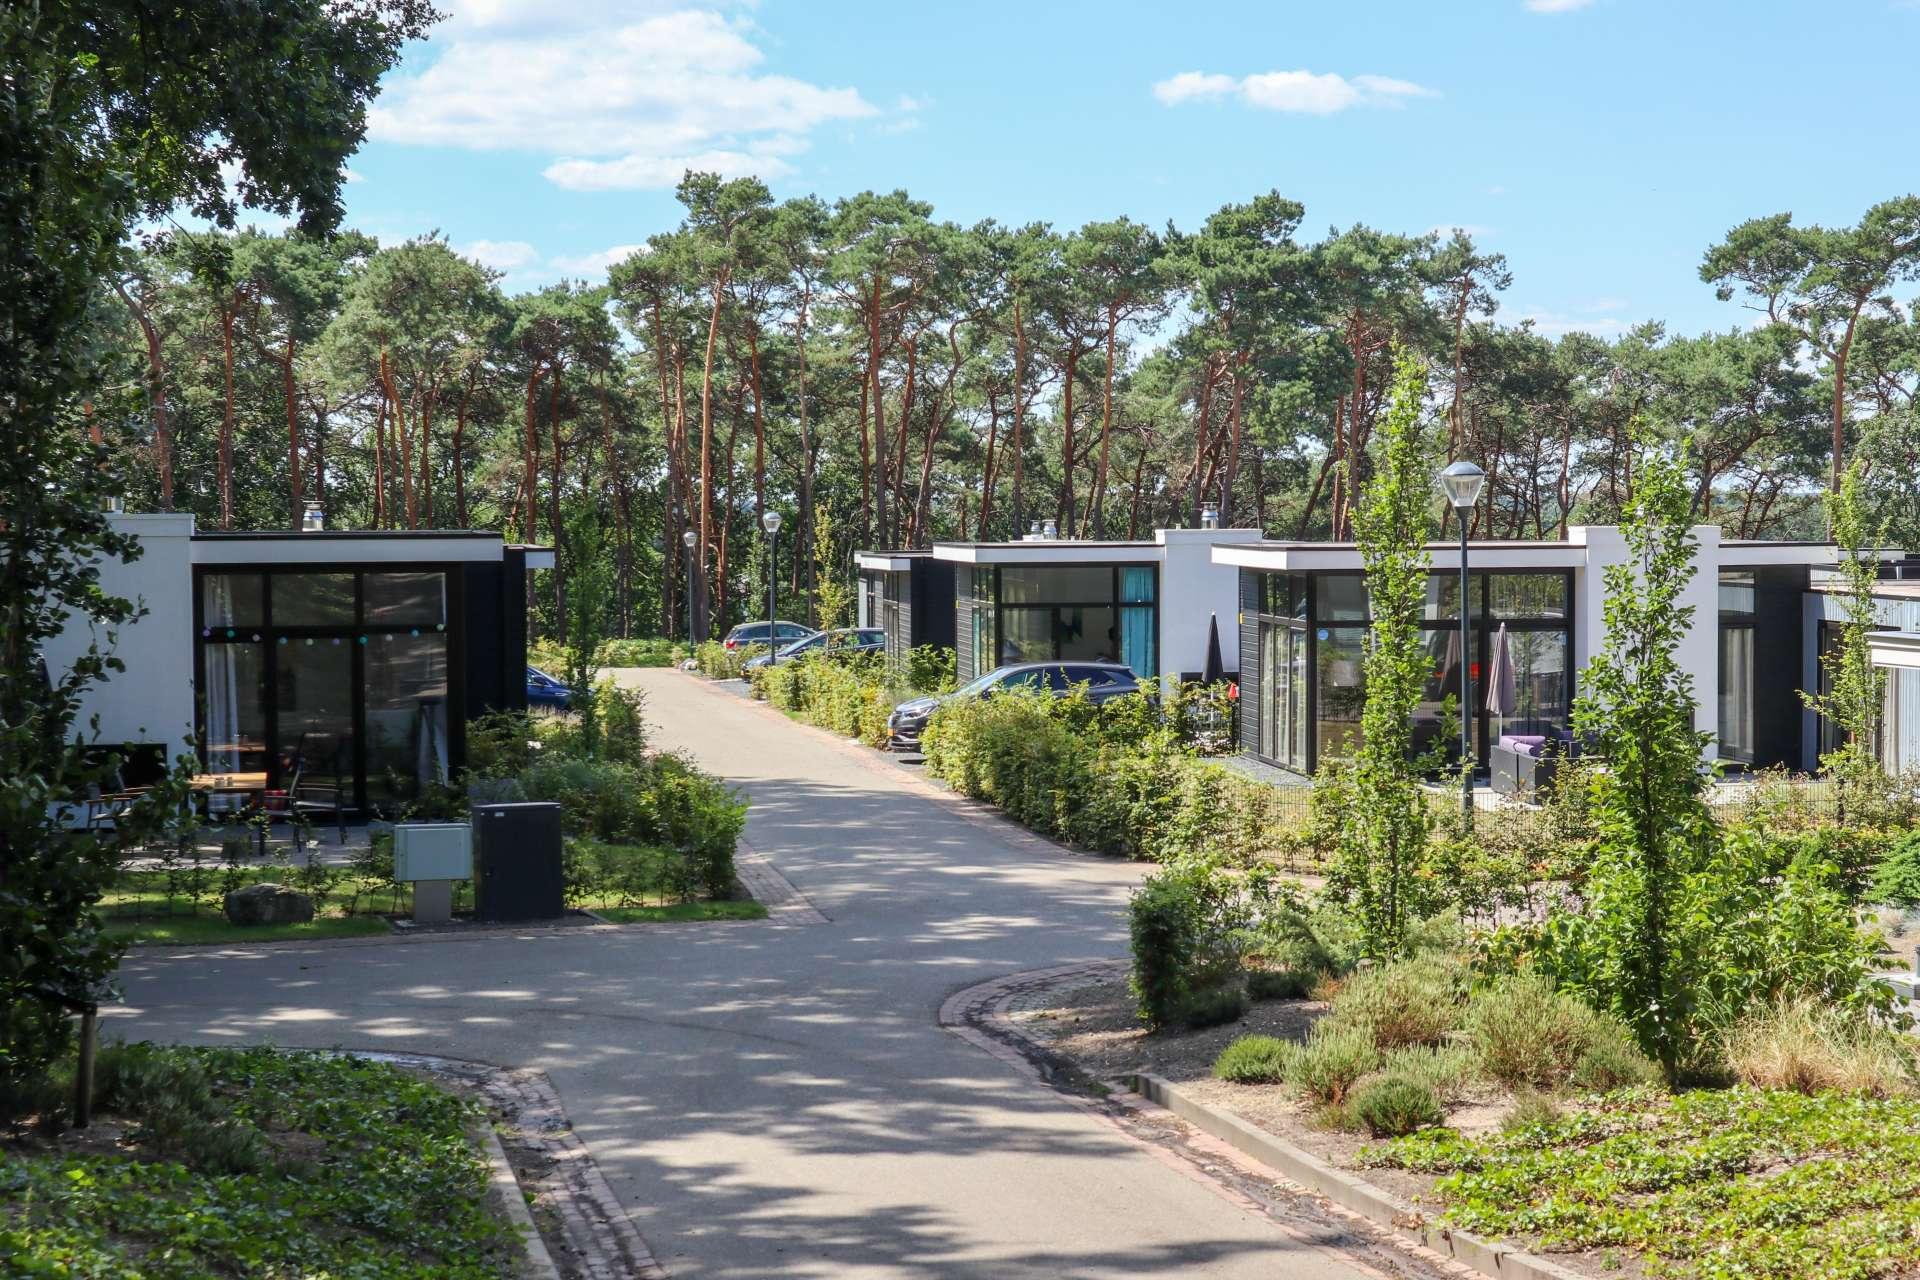 park-accomodations-europarcs-maasduinen